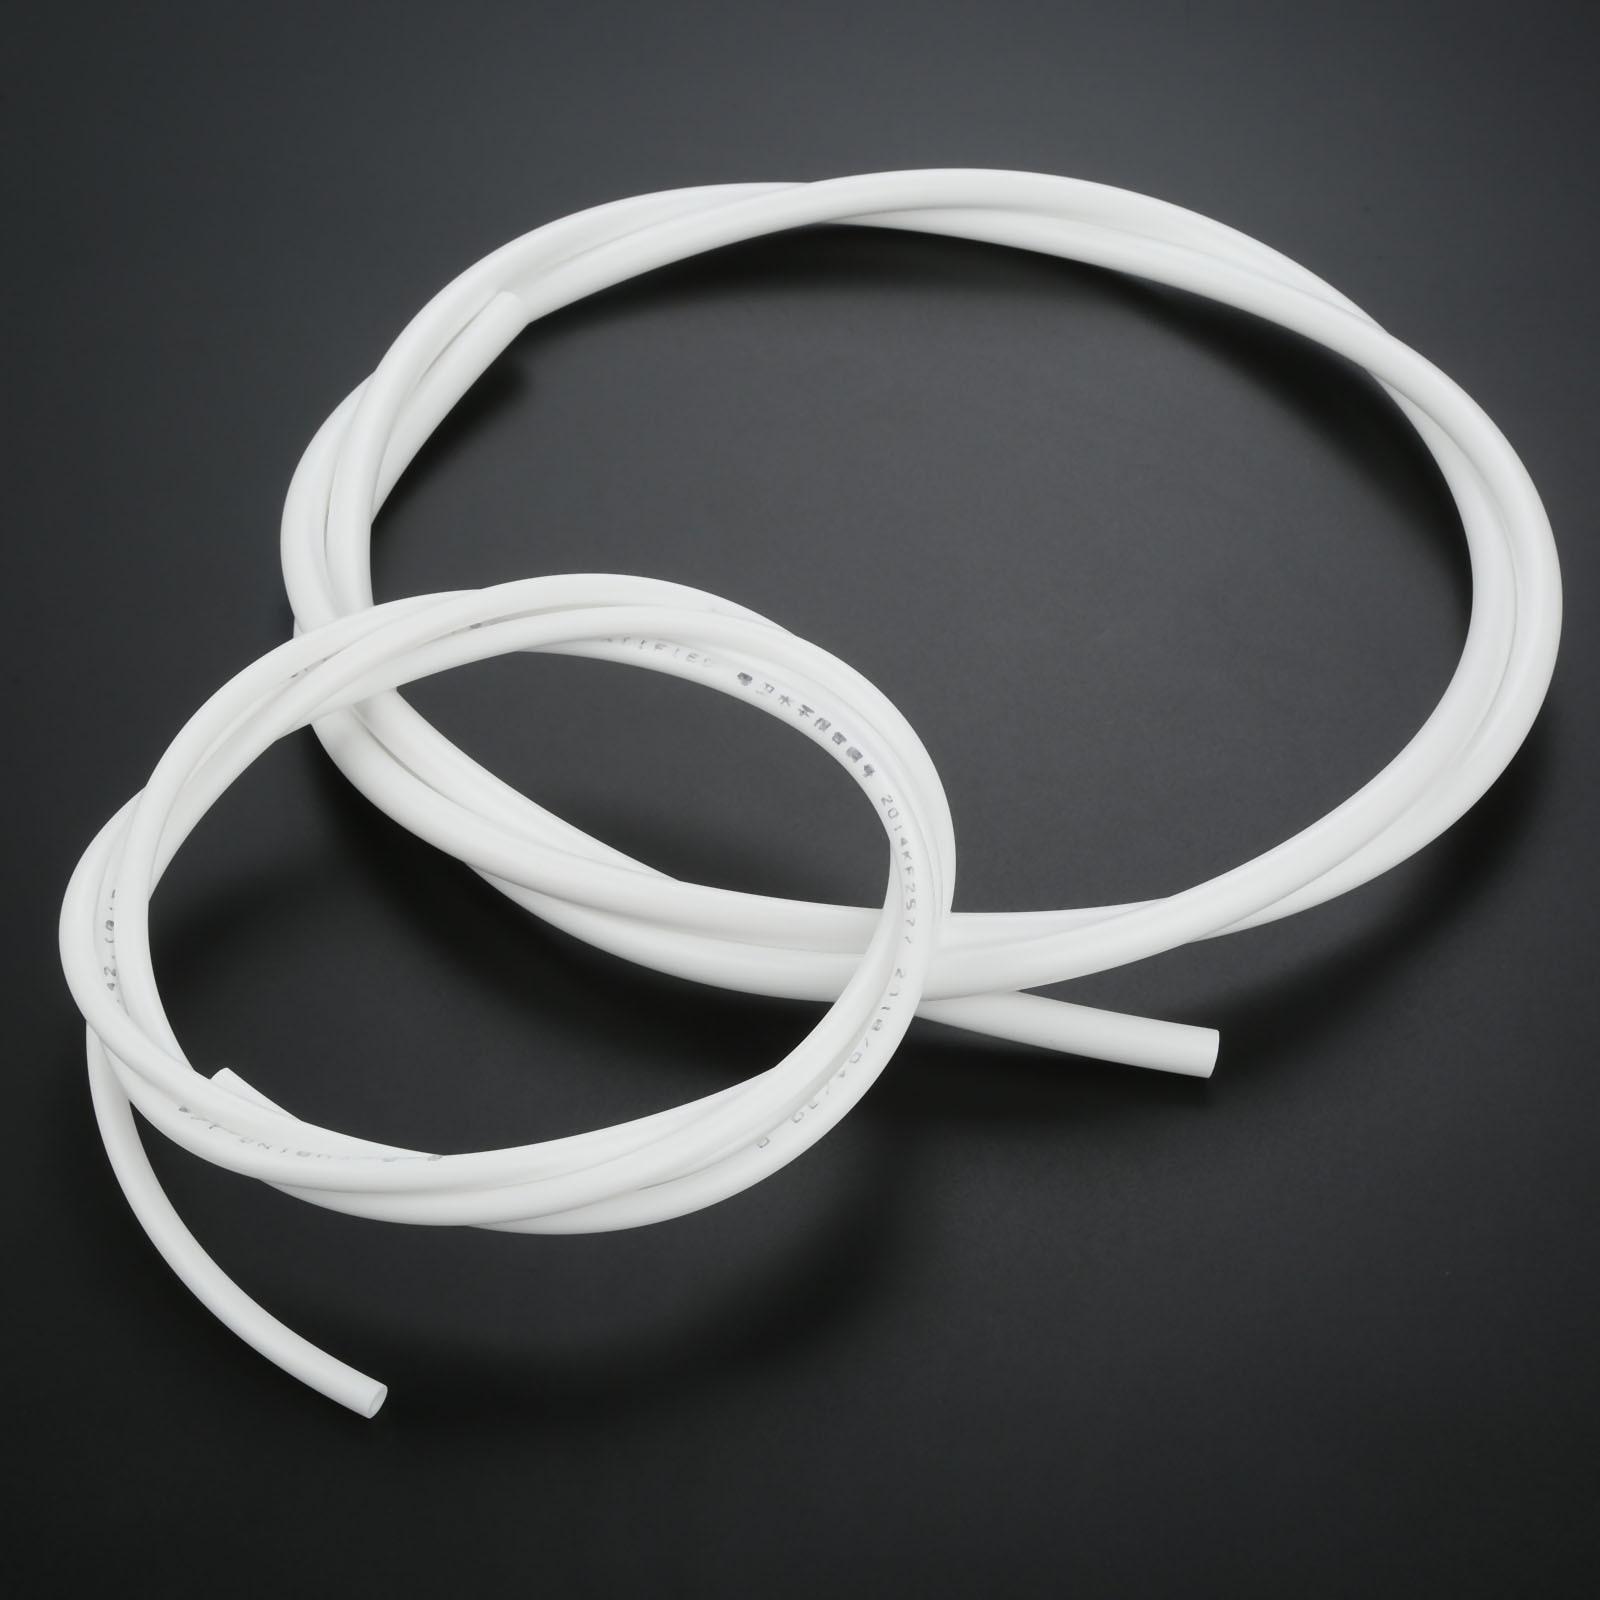 "2 Meter RO Water 1/4"" 3/8 Inch OD PE Hose Tubing White Flexible Pipe Tube For Reverse Osmosis Aquarium Filter System 2M/6.56ft"